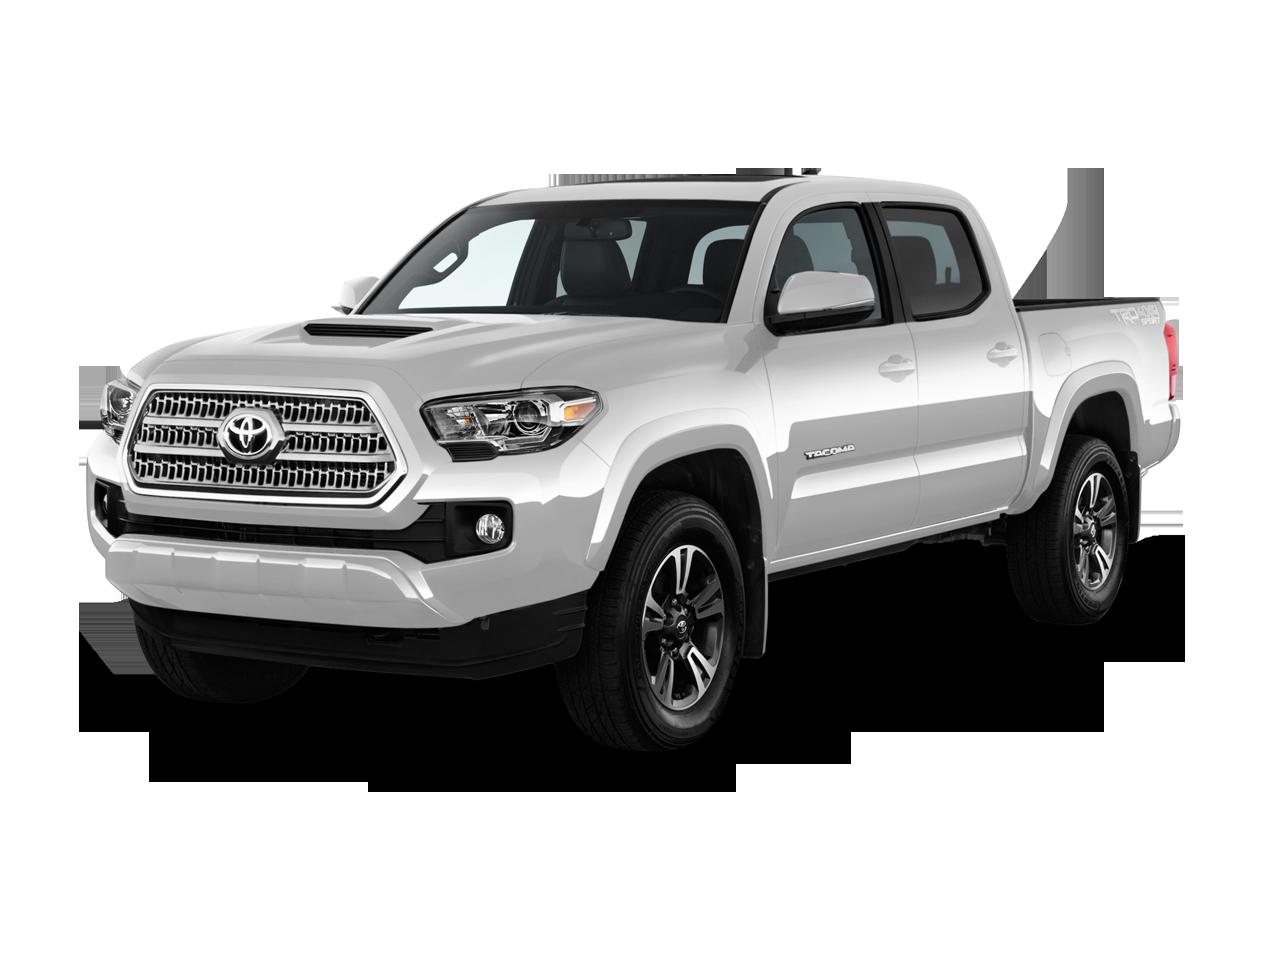 New 2017 Toyota Tacoma Trd Sport Crew Cab Pickup Near